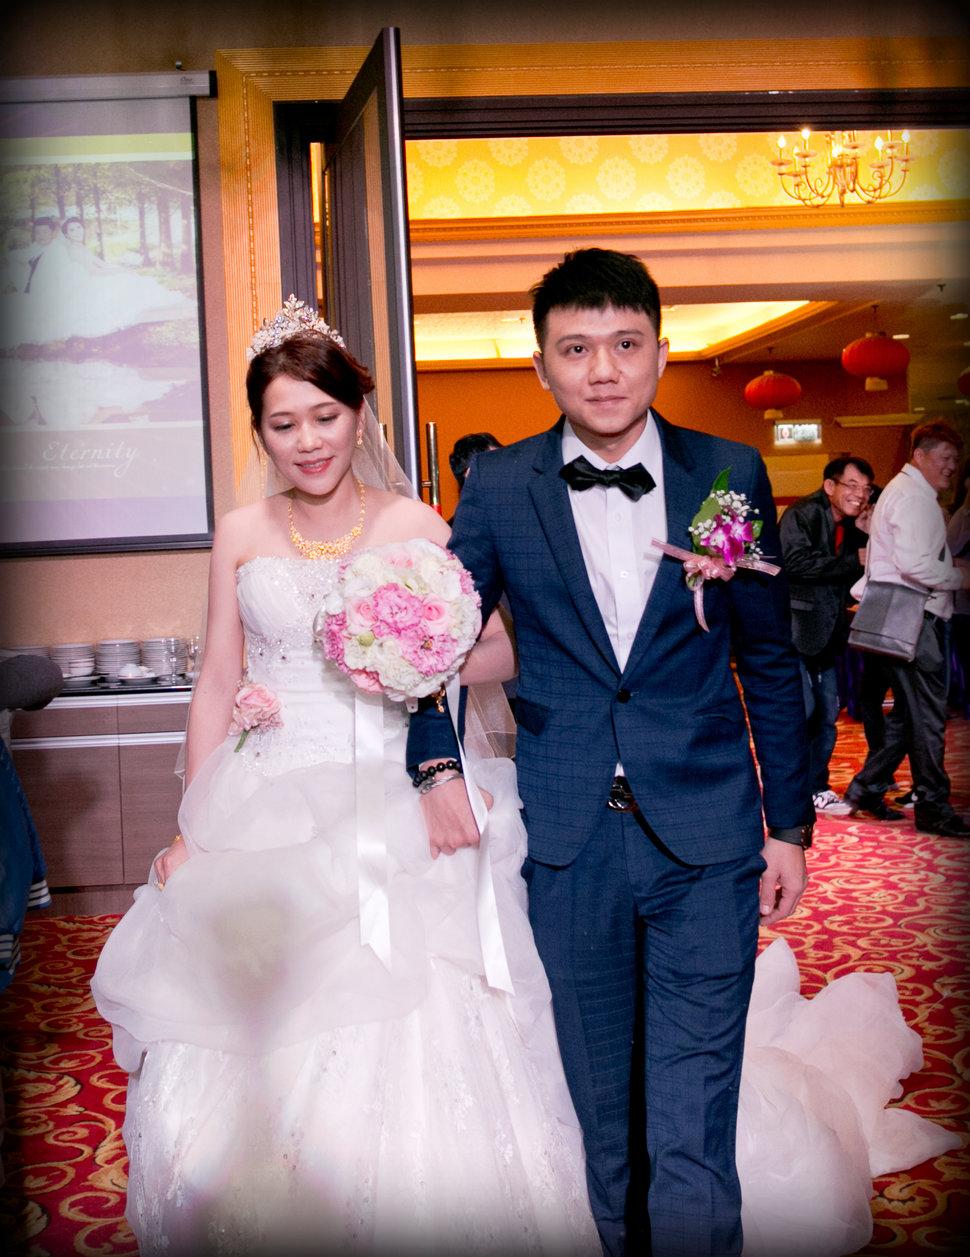 YF2A0985 - Yusin 攝影~與您同心祝福您永結同心 - 結婚吧